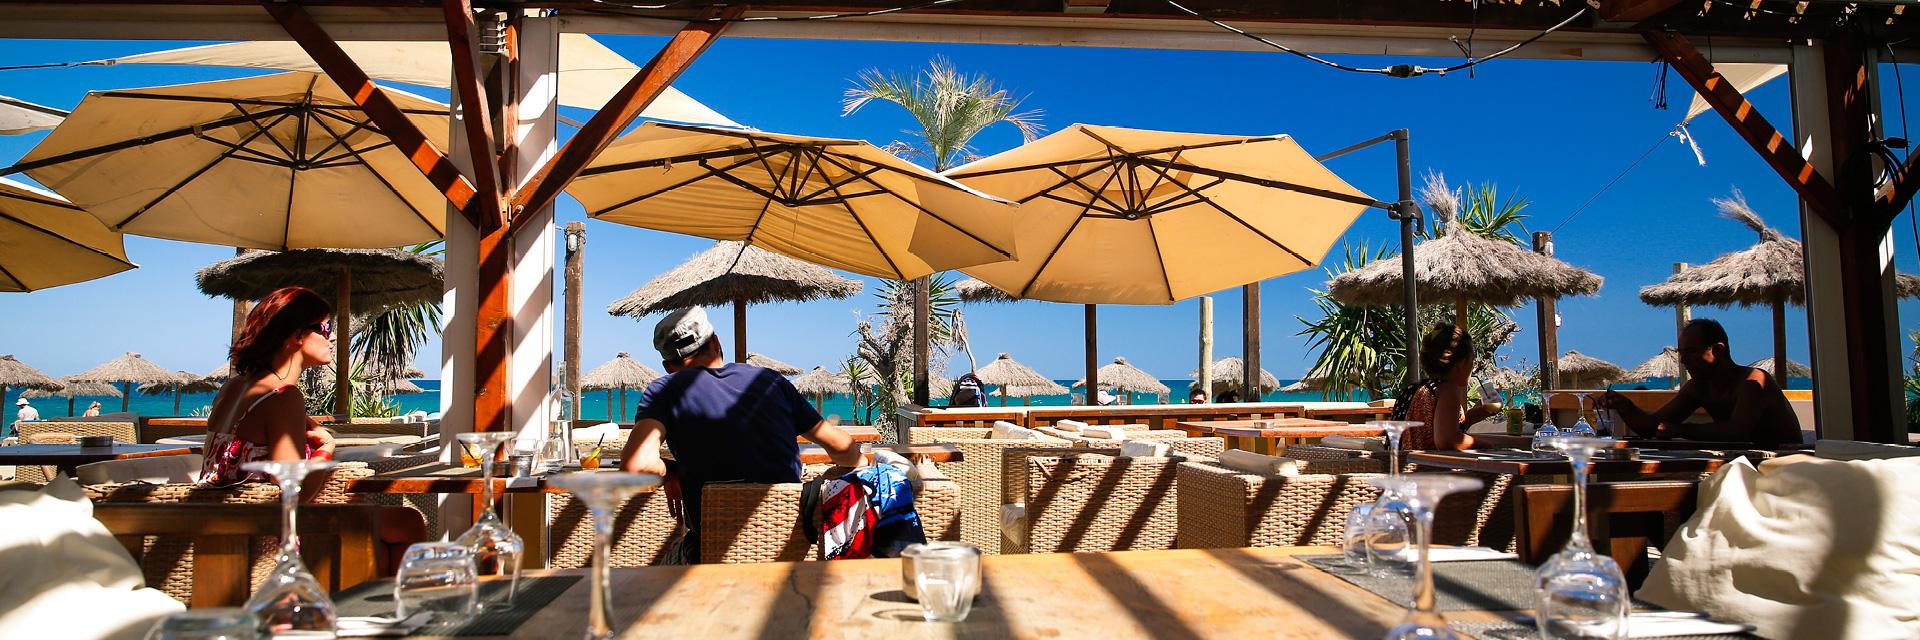 Restaurant club de plage